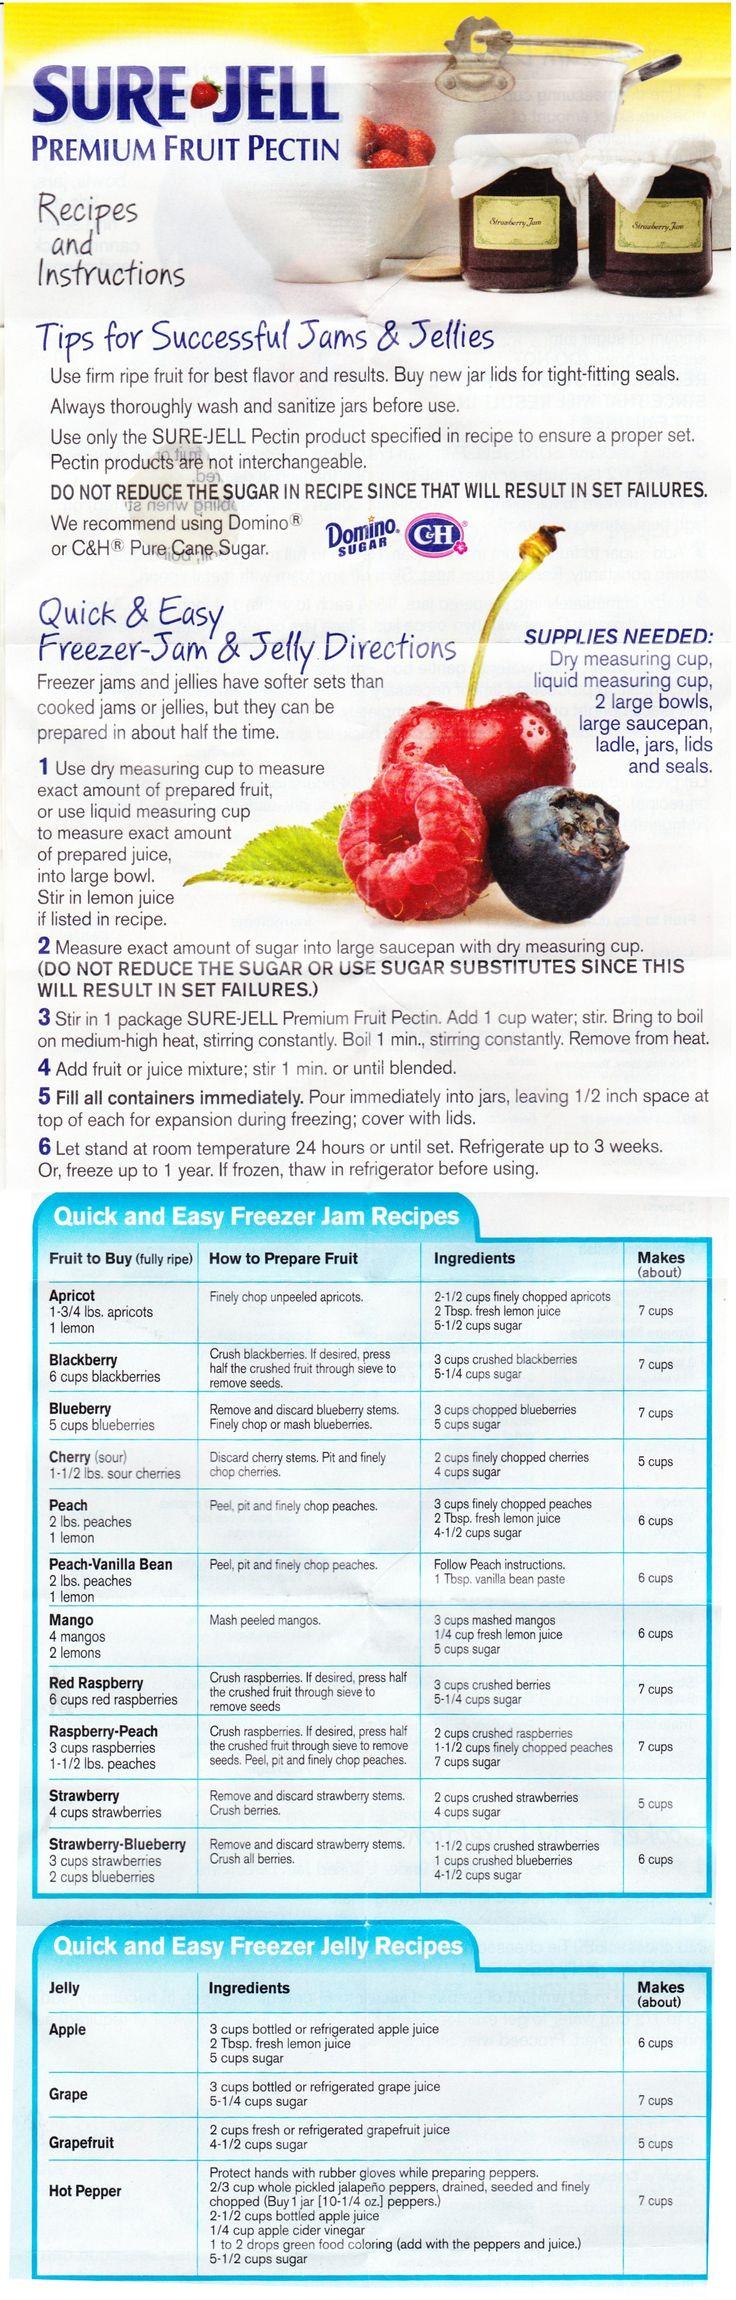 How to make jam with Sure Jell Pectin. Apricot, Blackberry, Blueberry, Cherry, Peach, Peach-Vanilla Bean, Mango, Red Raspberry, Raspberry-Peach, Strawberry, Strawberry-Blueberry